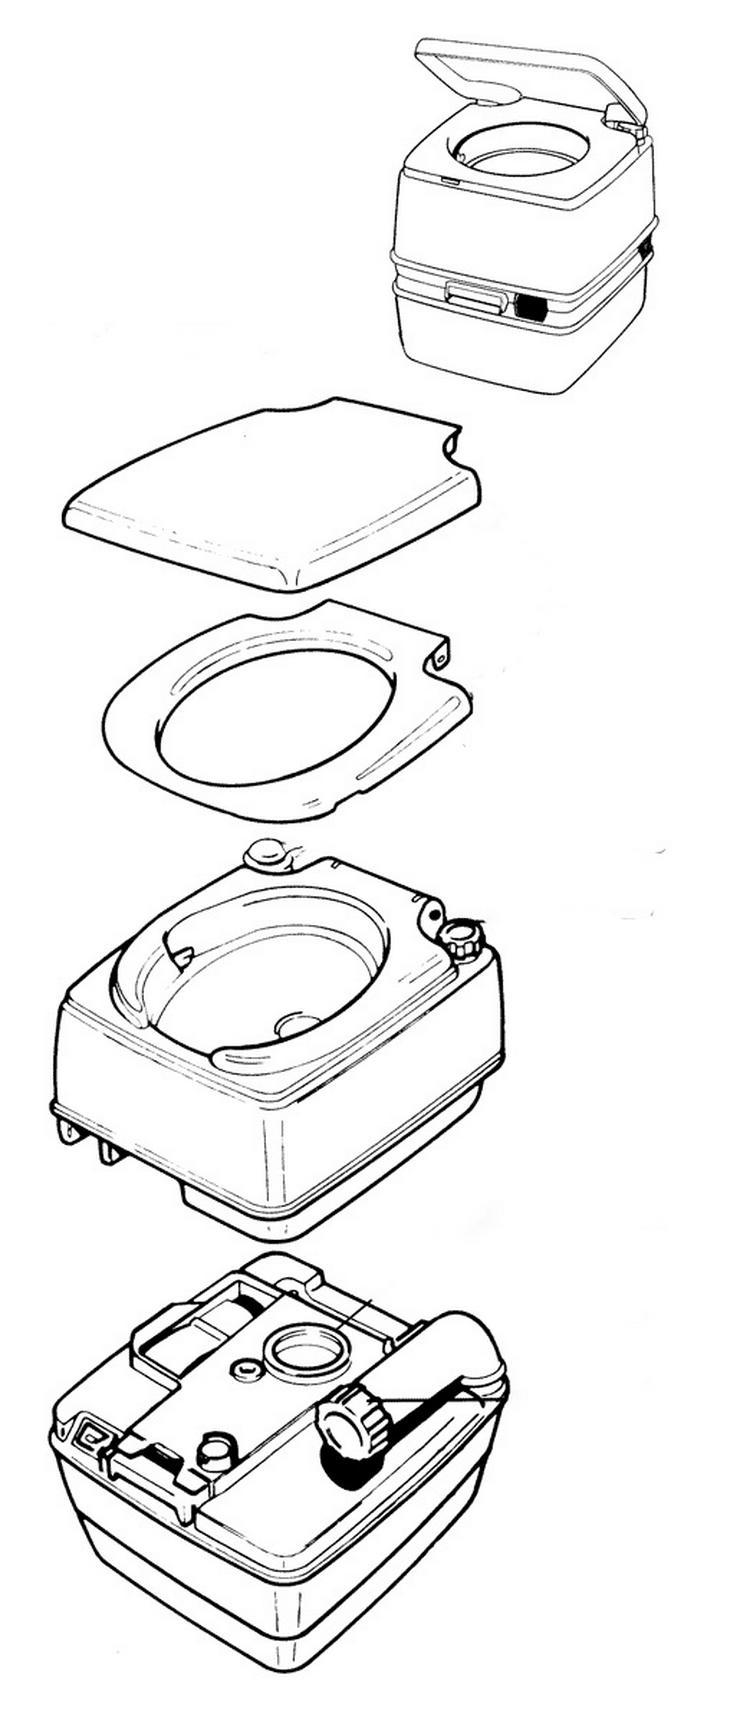 Bild 3: Biotoilette, caravan WC